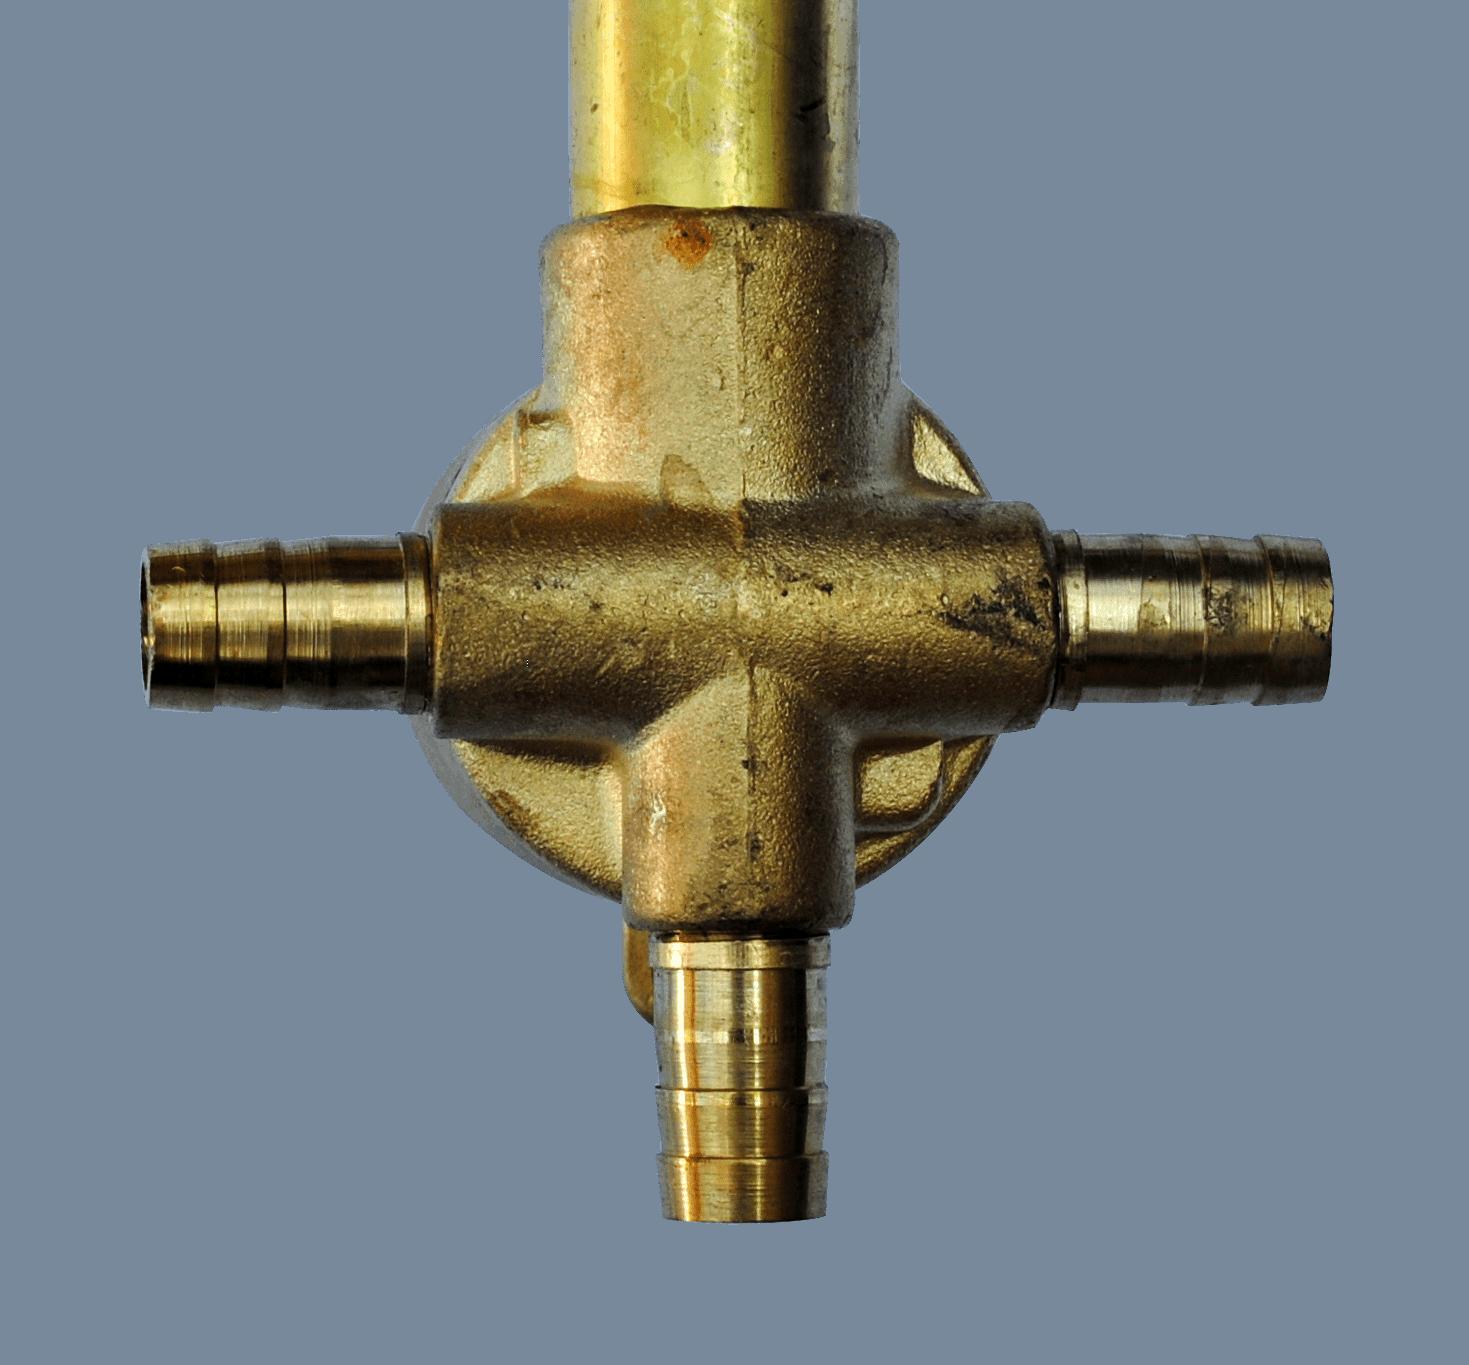 2 dial shower mixer valve 100mm centres 2 3 4 5 outputs. Black Bedroom Furniture Sets. Home Design Ideas